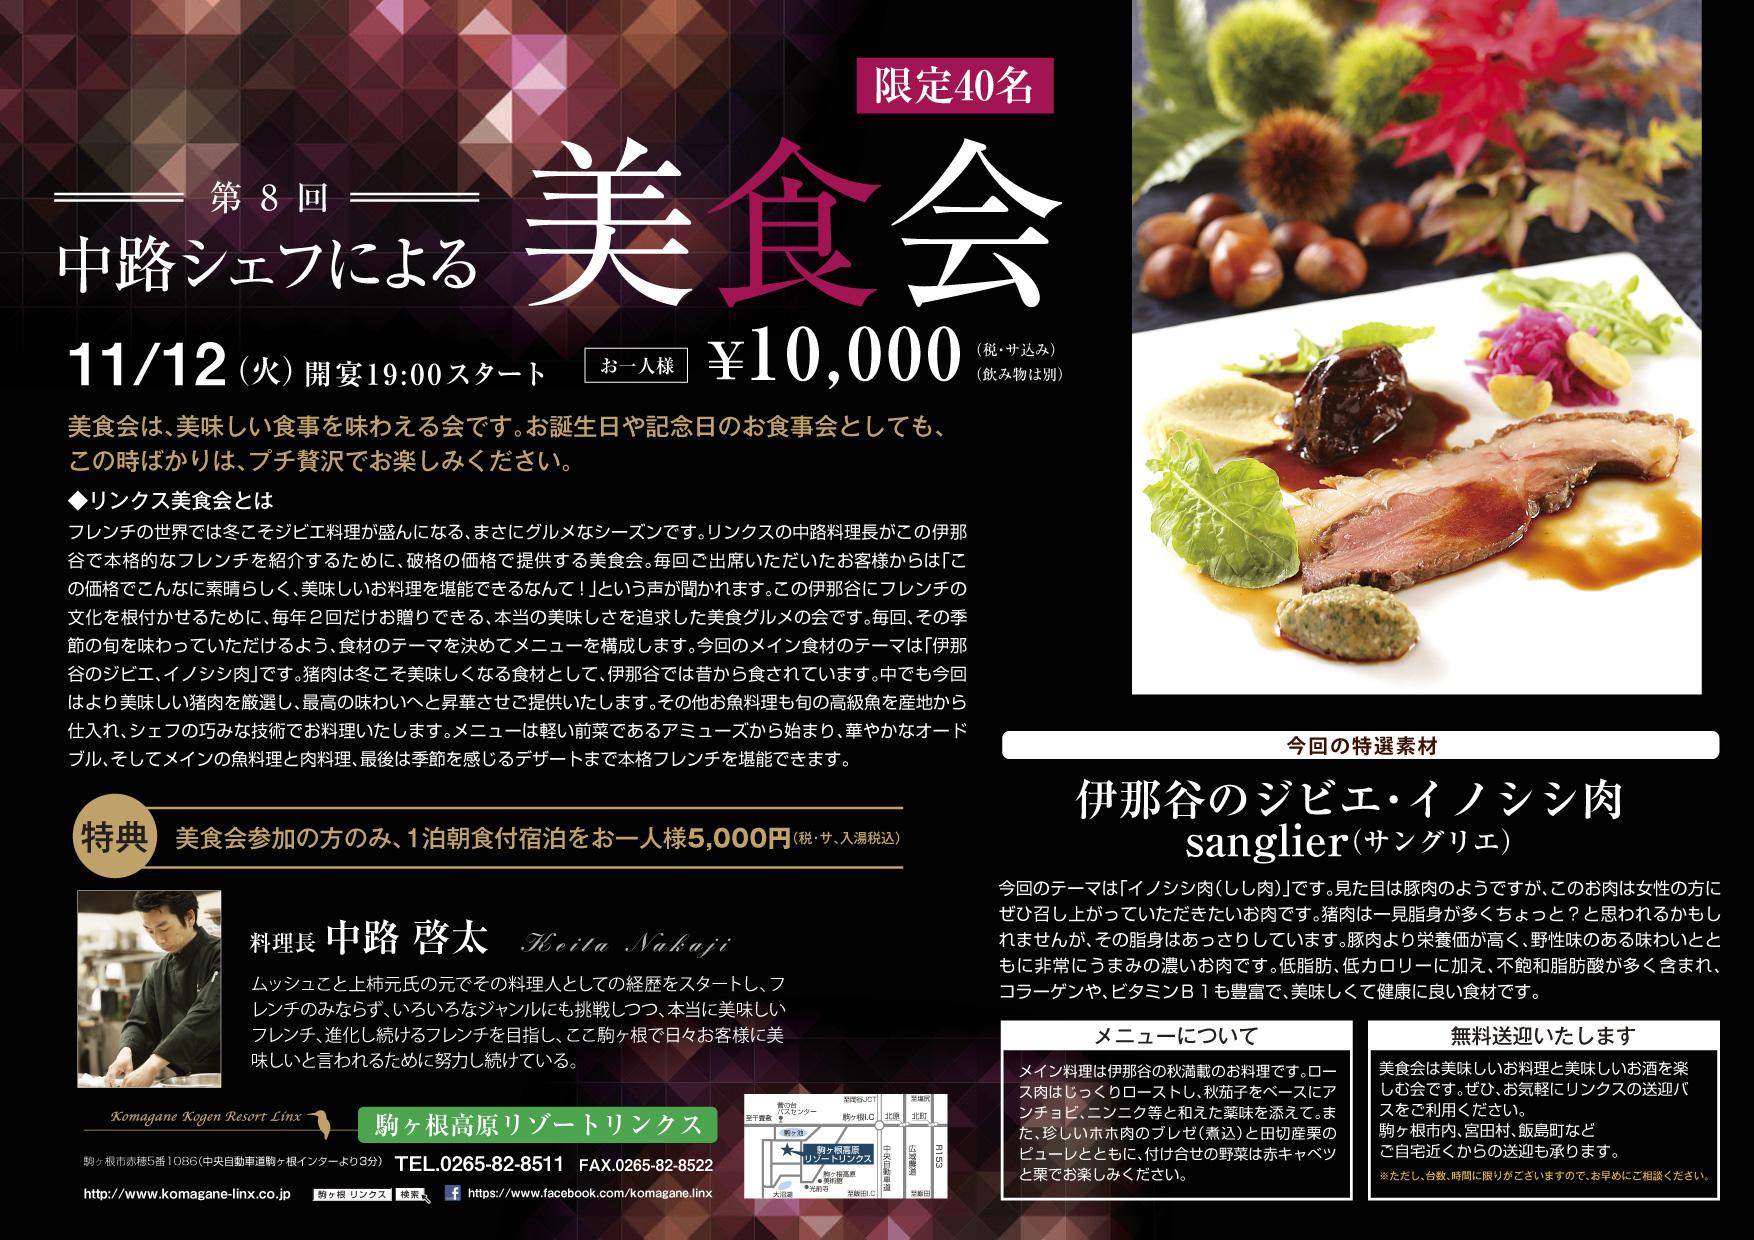 http://www.komagane-linx.co.jp/hotel_0130926_kamiina01.jpg